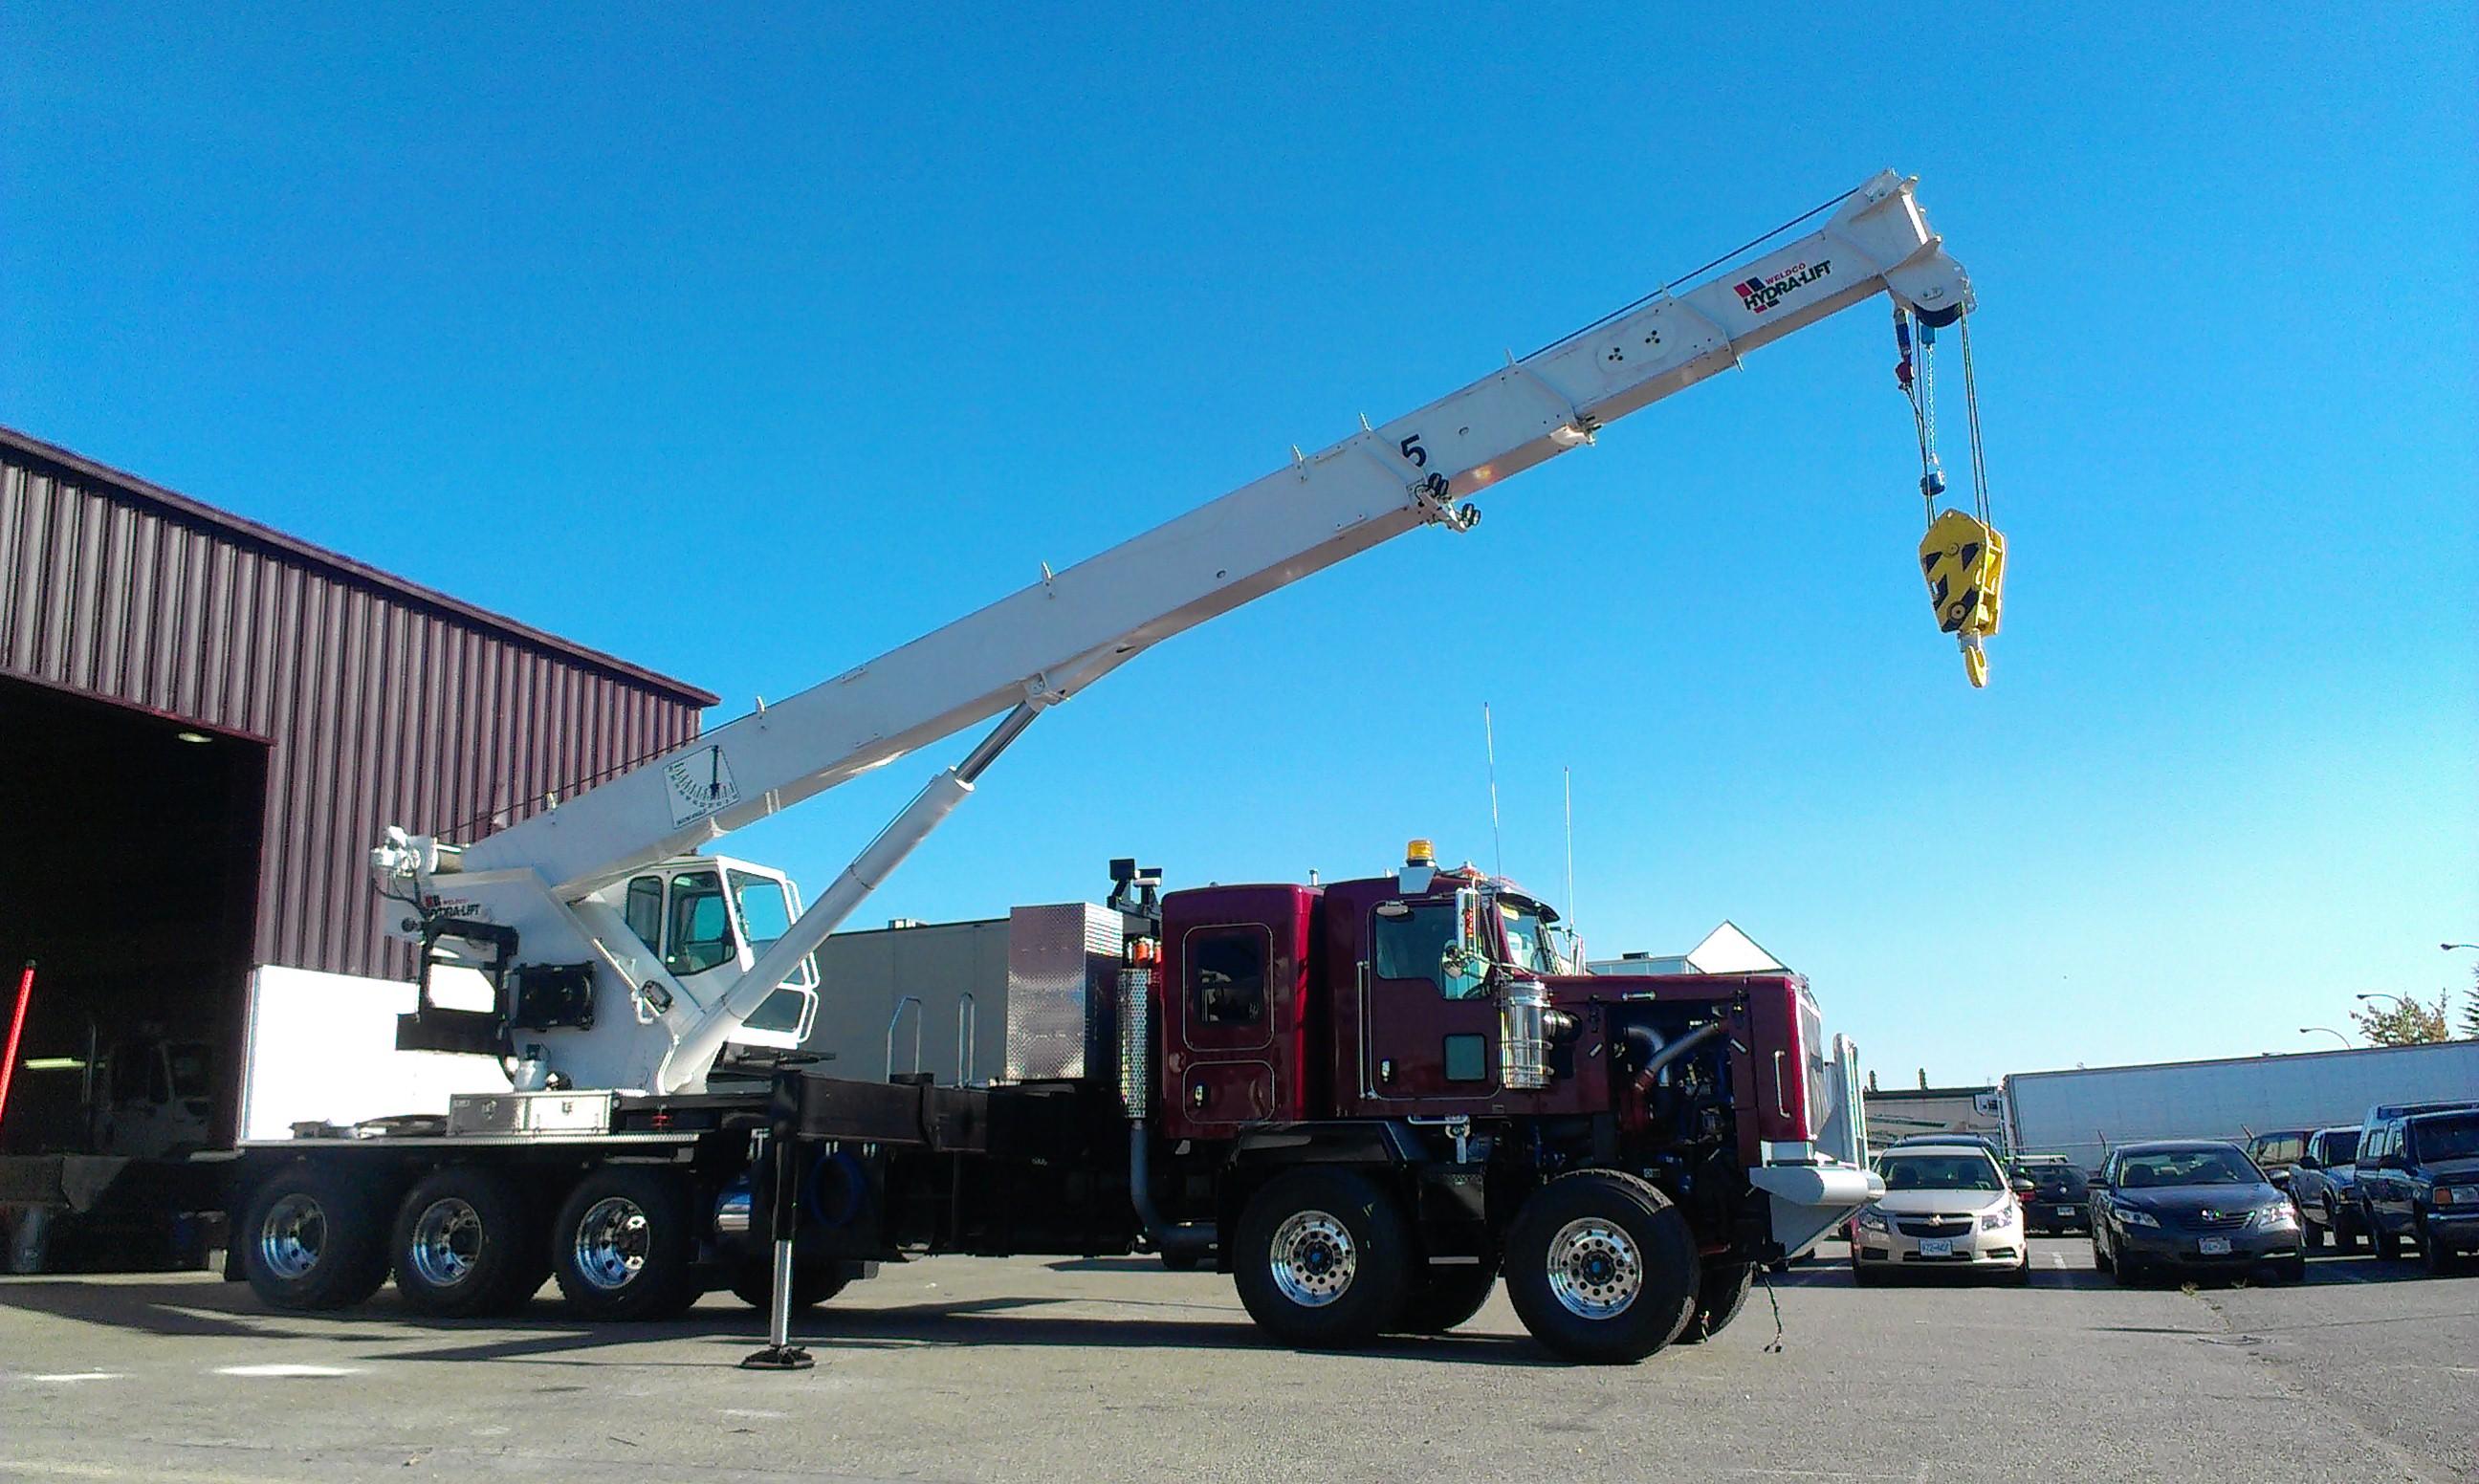 Tractor Hydraulic Boom Crane : Stiff boom cranes for trucks commercial truck equipment